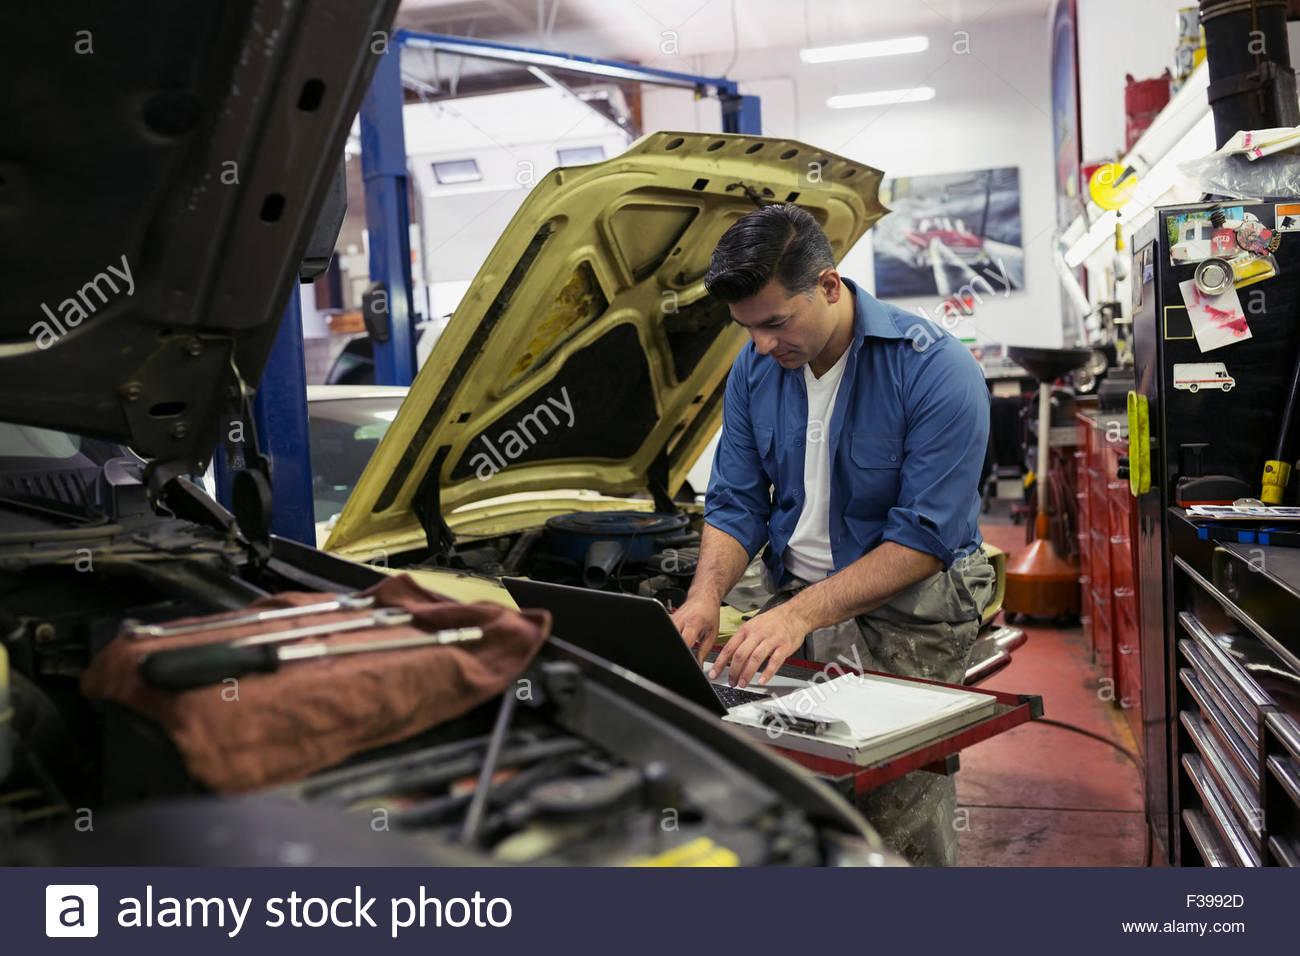 Mechanic diagnostic testing at laptop auto repair shop Stock Photo